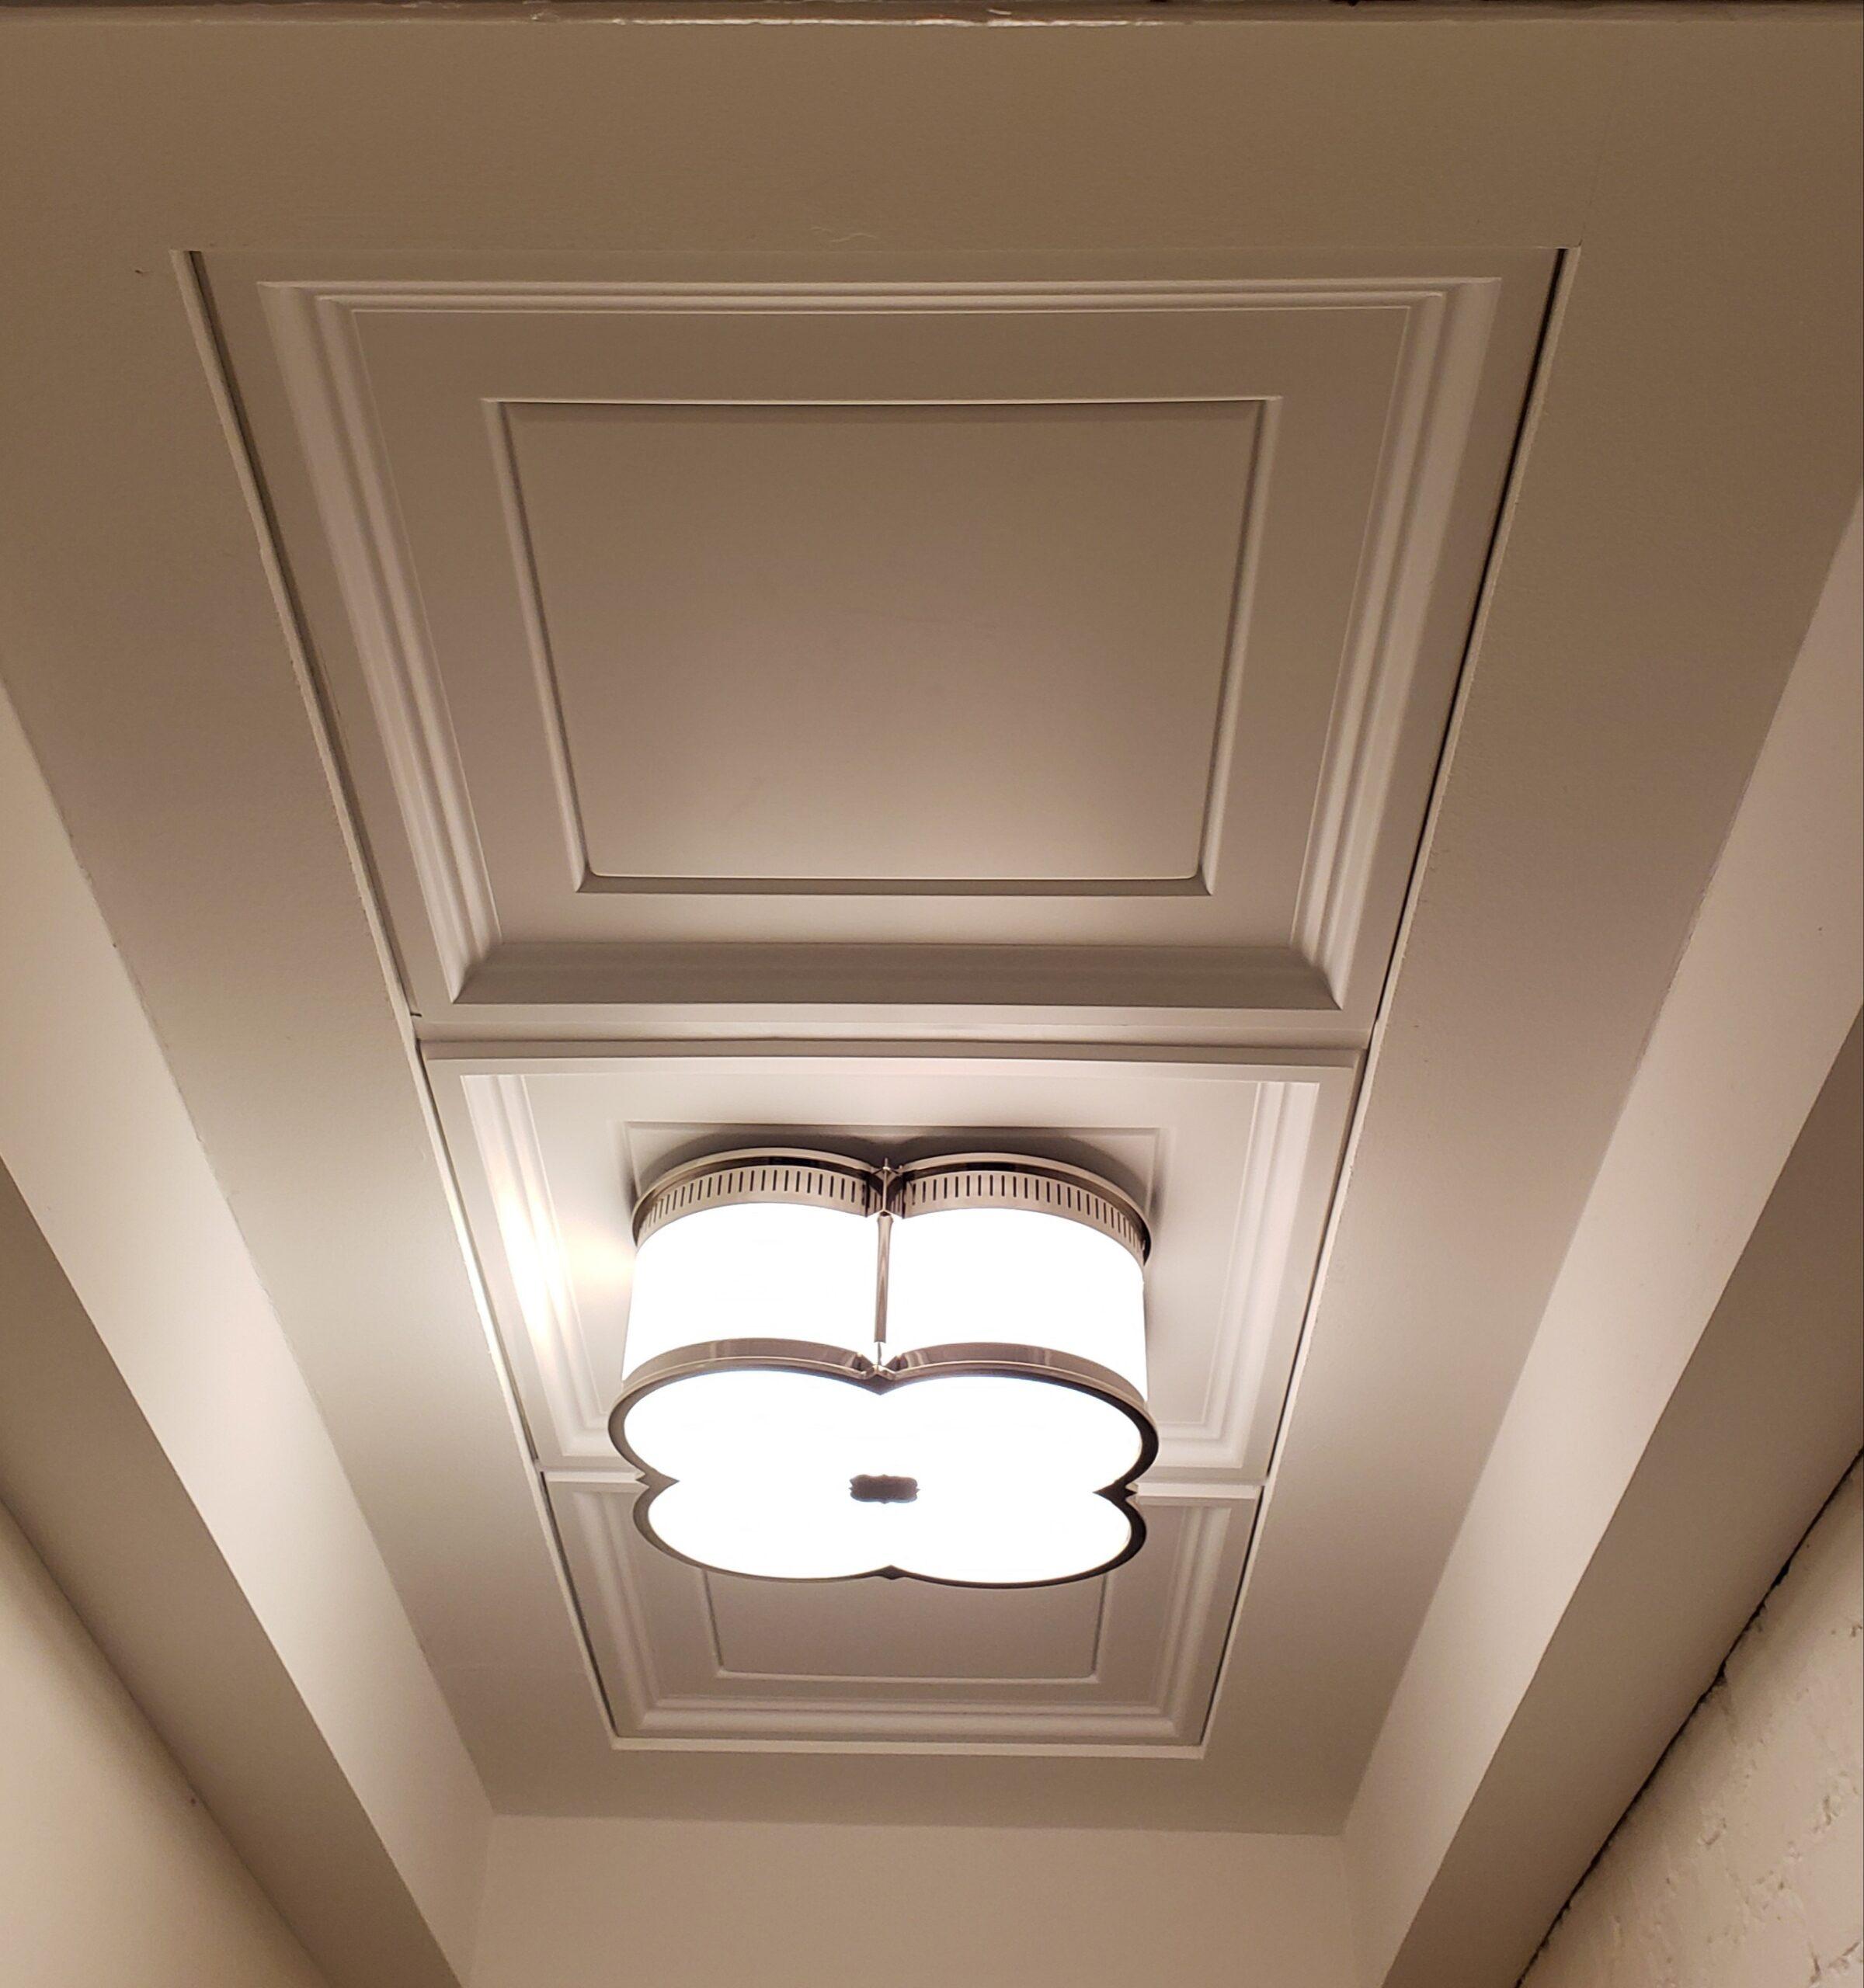 14278512-cece-48c5-a3de-748432824947marks hallway